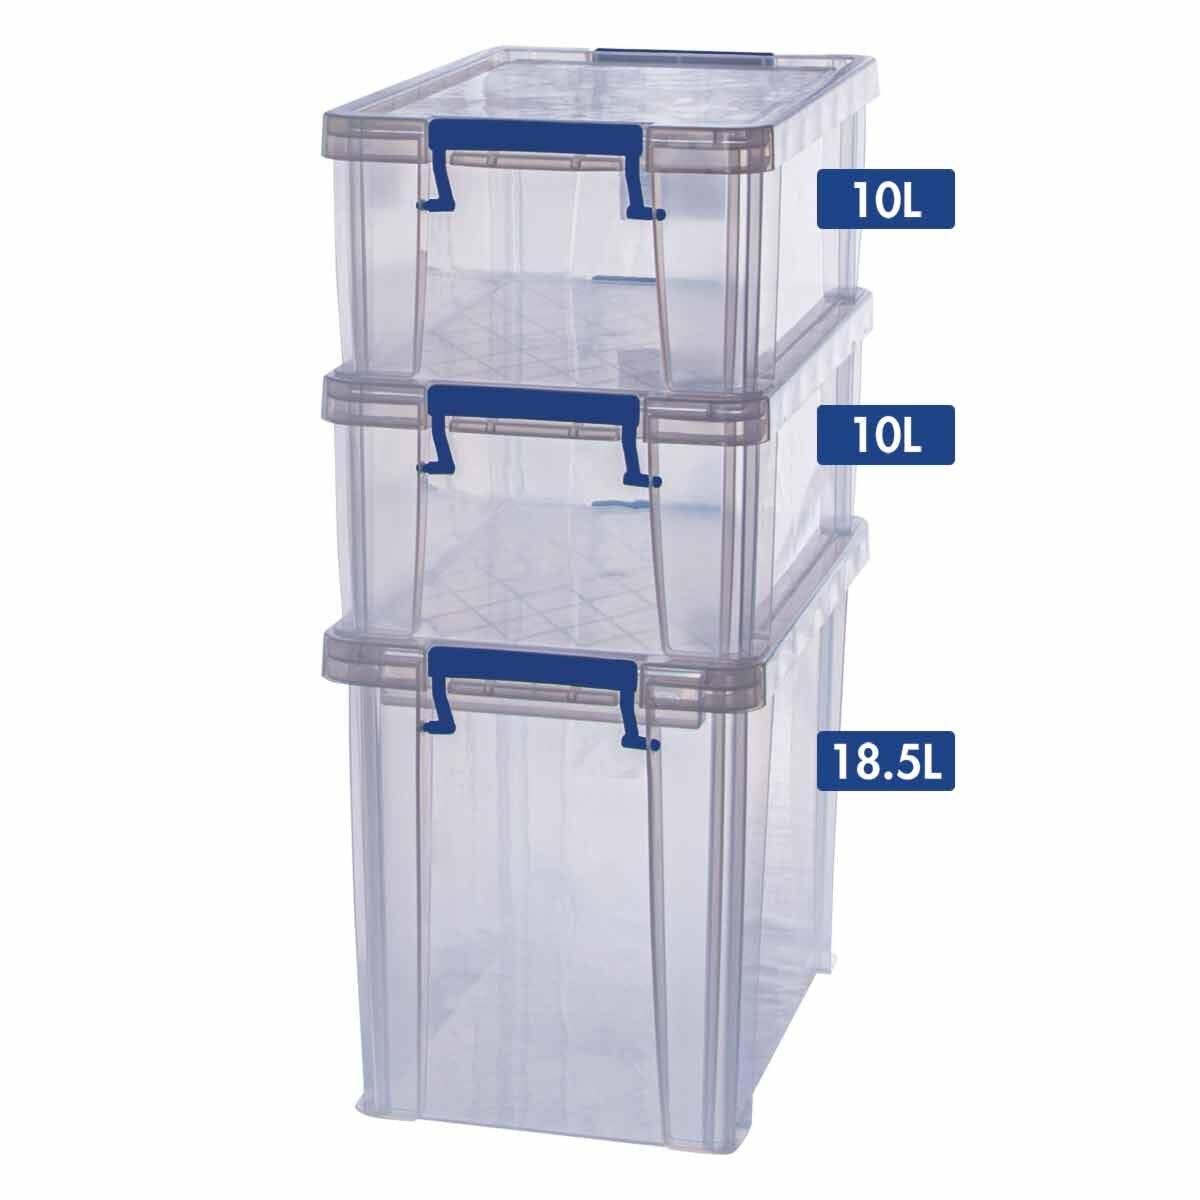 ProStore Storage Box Bonus Pack 4 38.5L Capacity